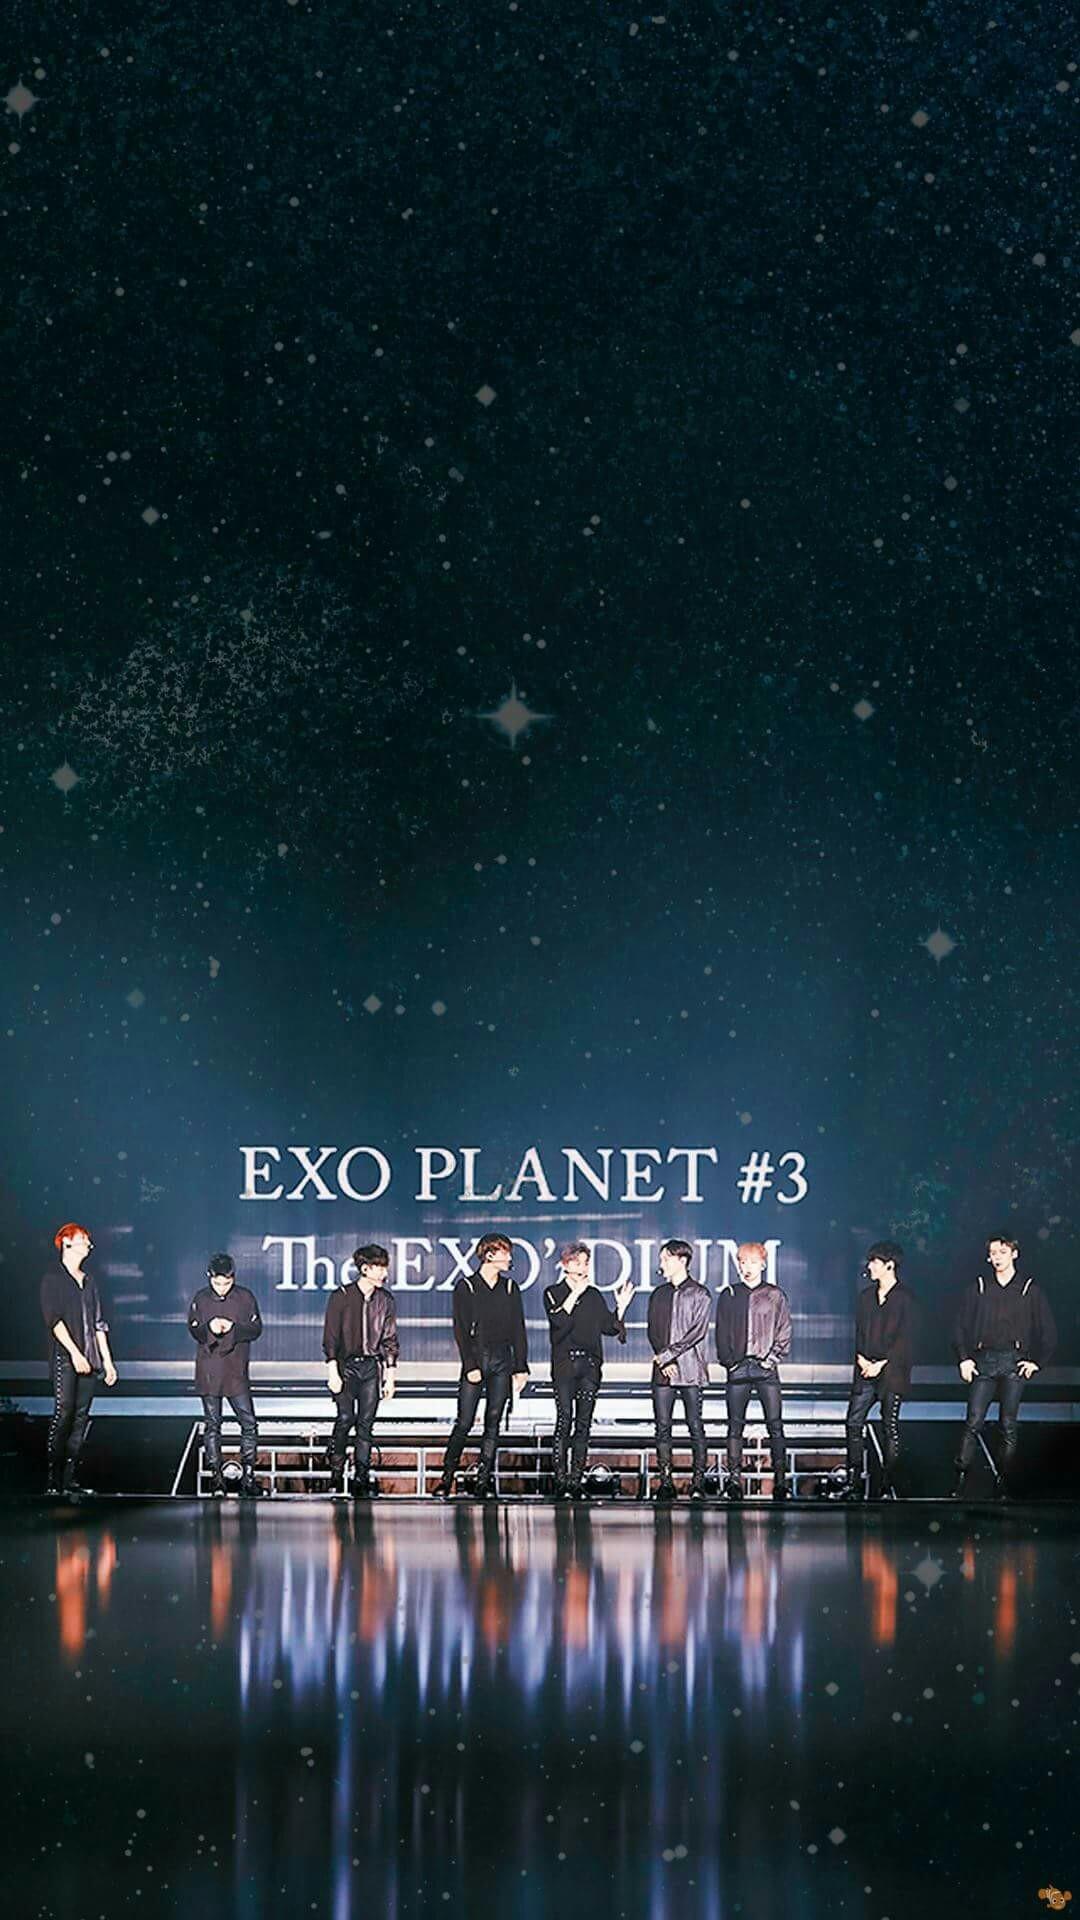 exo logo wallpaper hd iphone